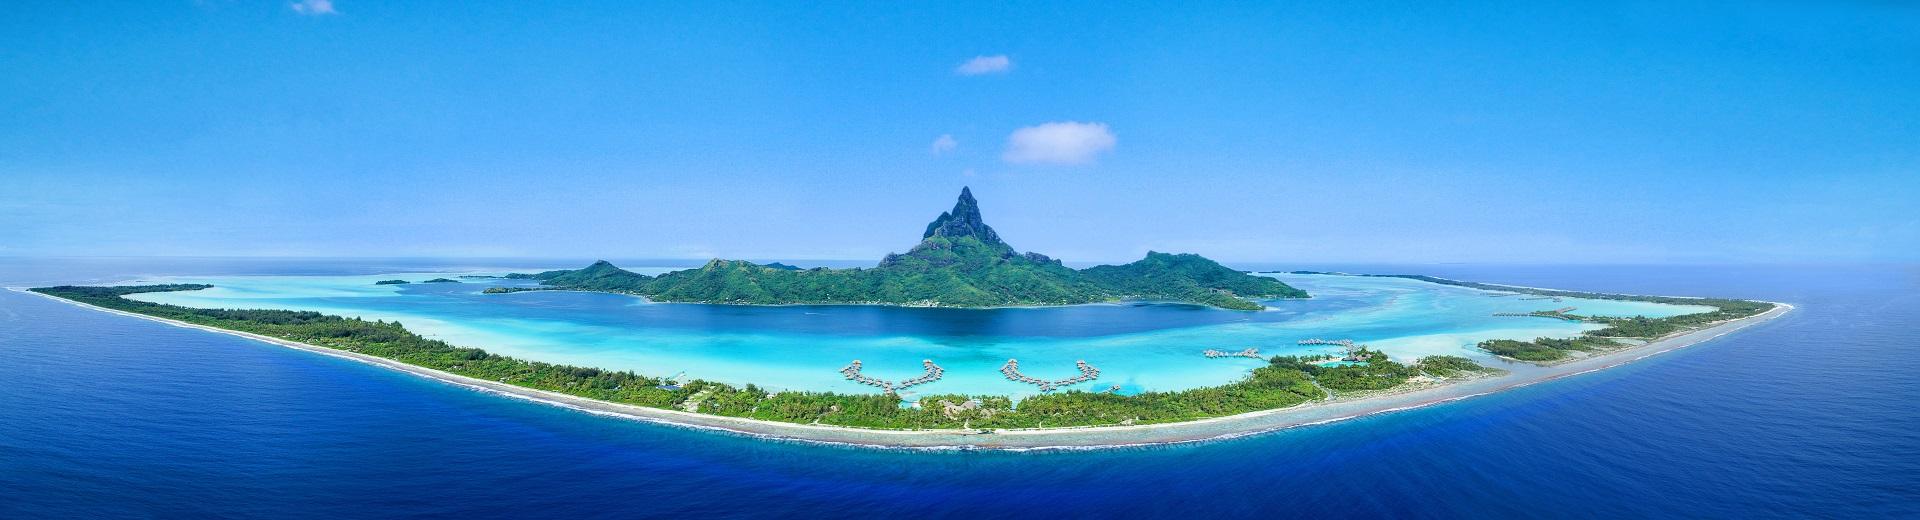 https://tahititourisme.com.au/wp-content/uploads/2019/12/BOB-Intercontinental-Thalasso-Aerial-View-6-banner.jpg